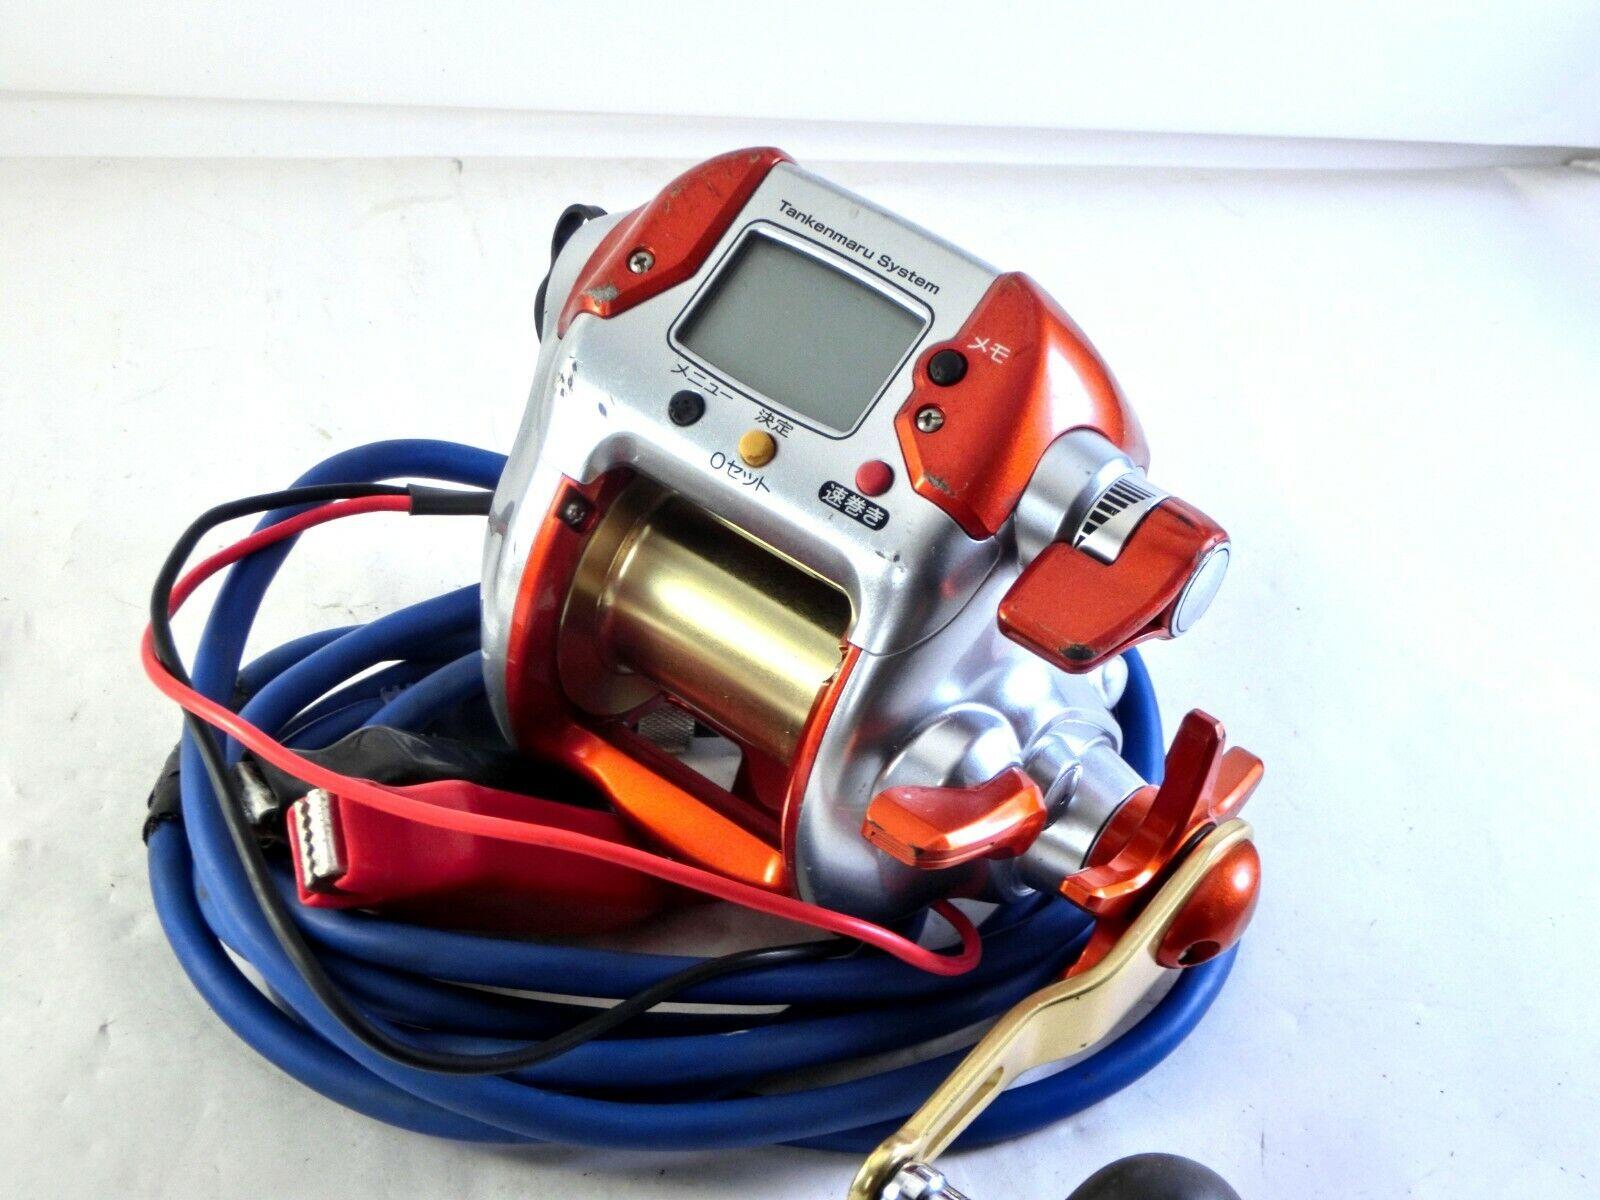 Shiuomoo Dendoumaru 3000 SQUID IKA specialee Electric Reel inglese uomoual Good